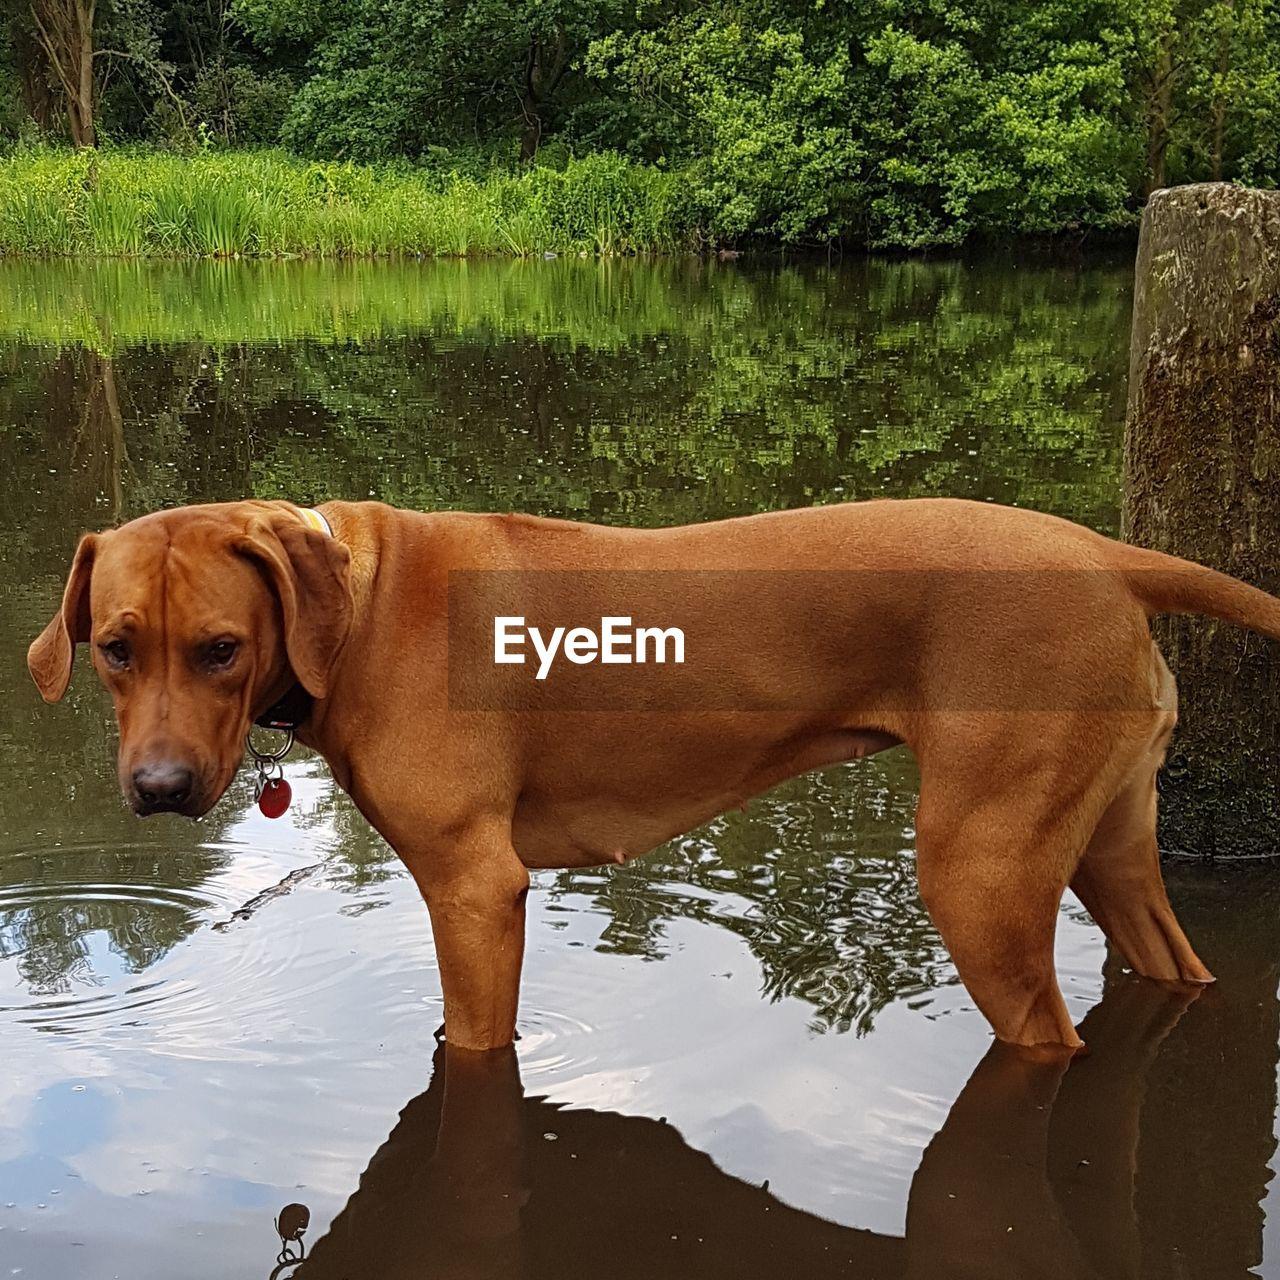 dog, domestic animals, mammal, water, pets, animal themes, lake, one animal, reflection, nature, day, outdoors, no people, tree